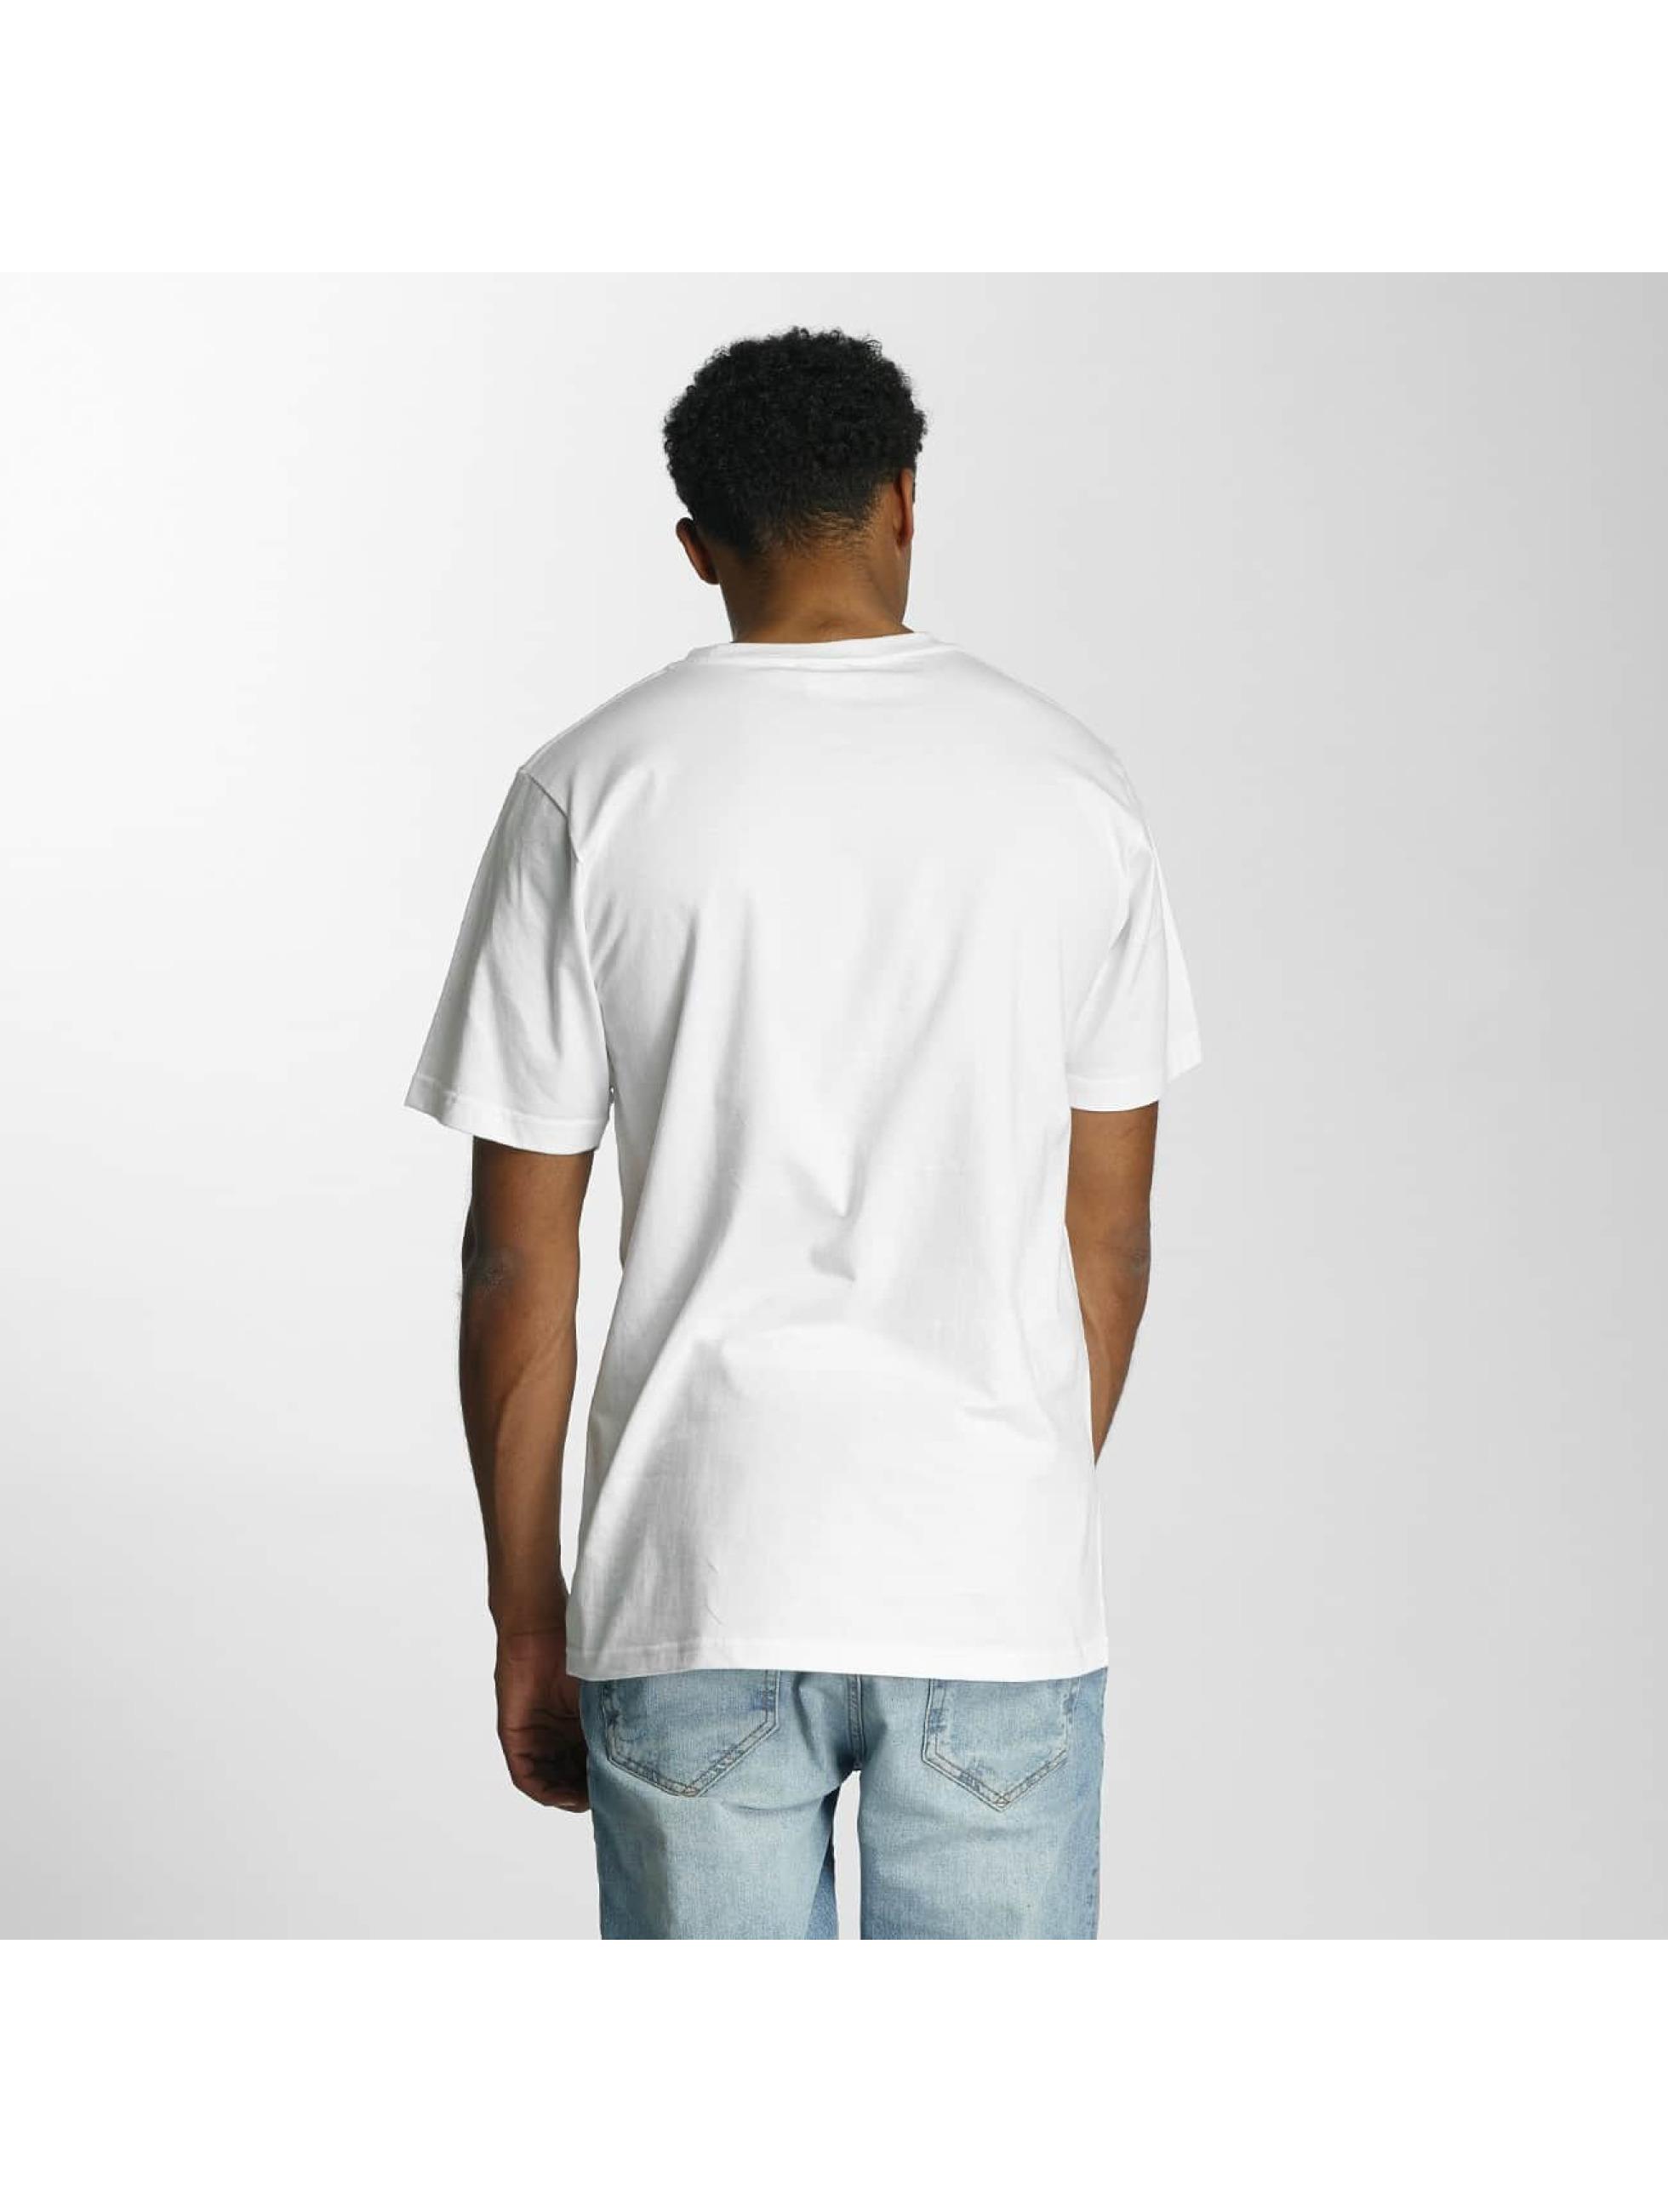 LRG T-Shirt Grind weiß